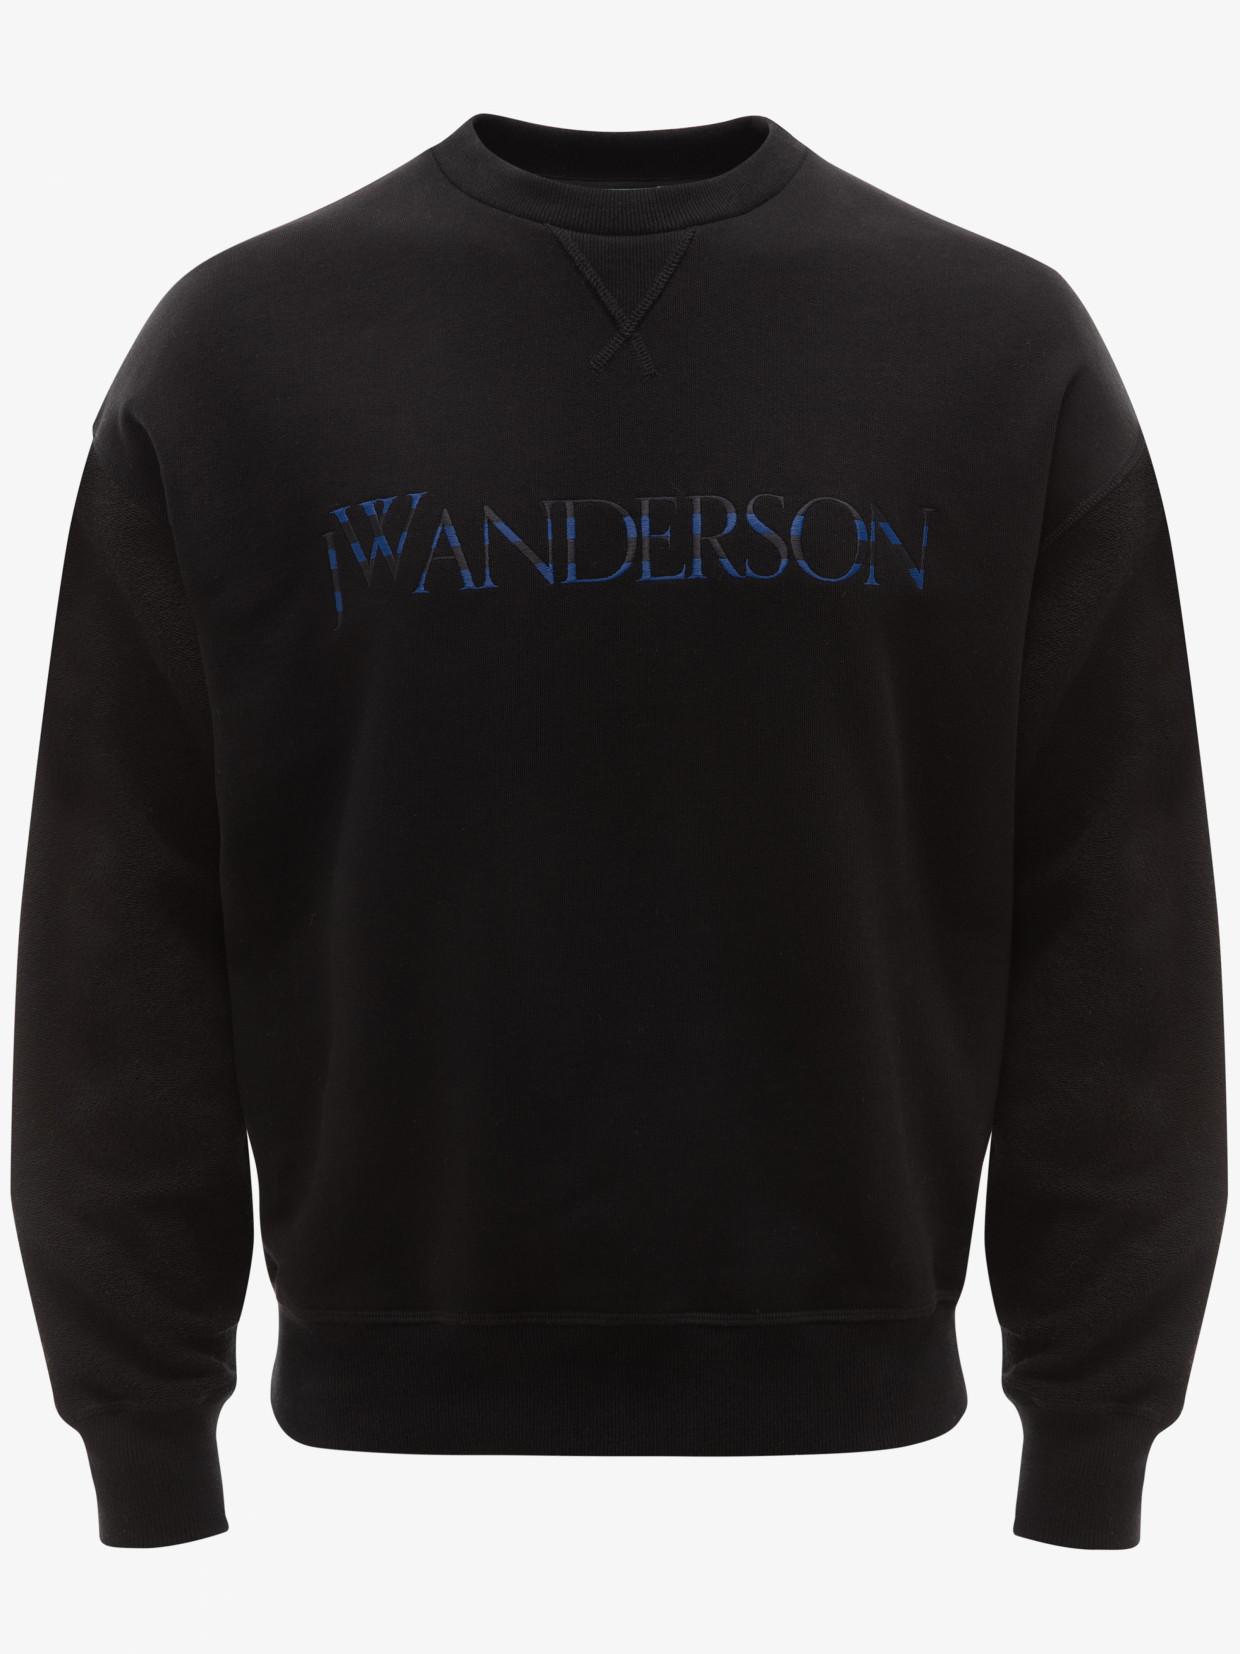 JW ANDERSON POP UP SHOP